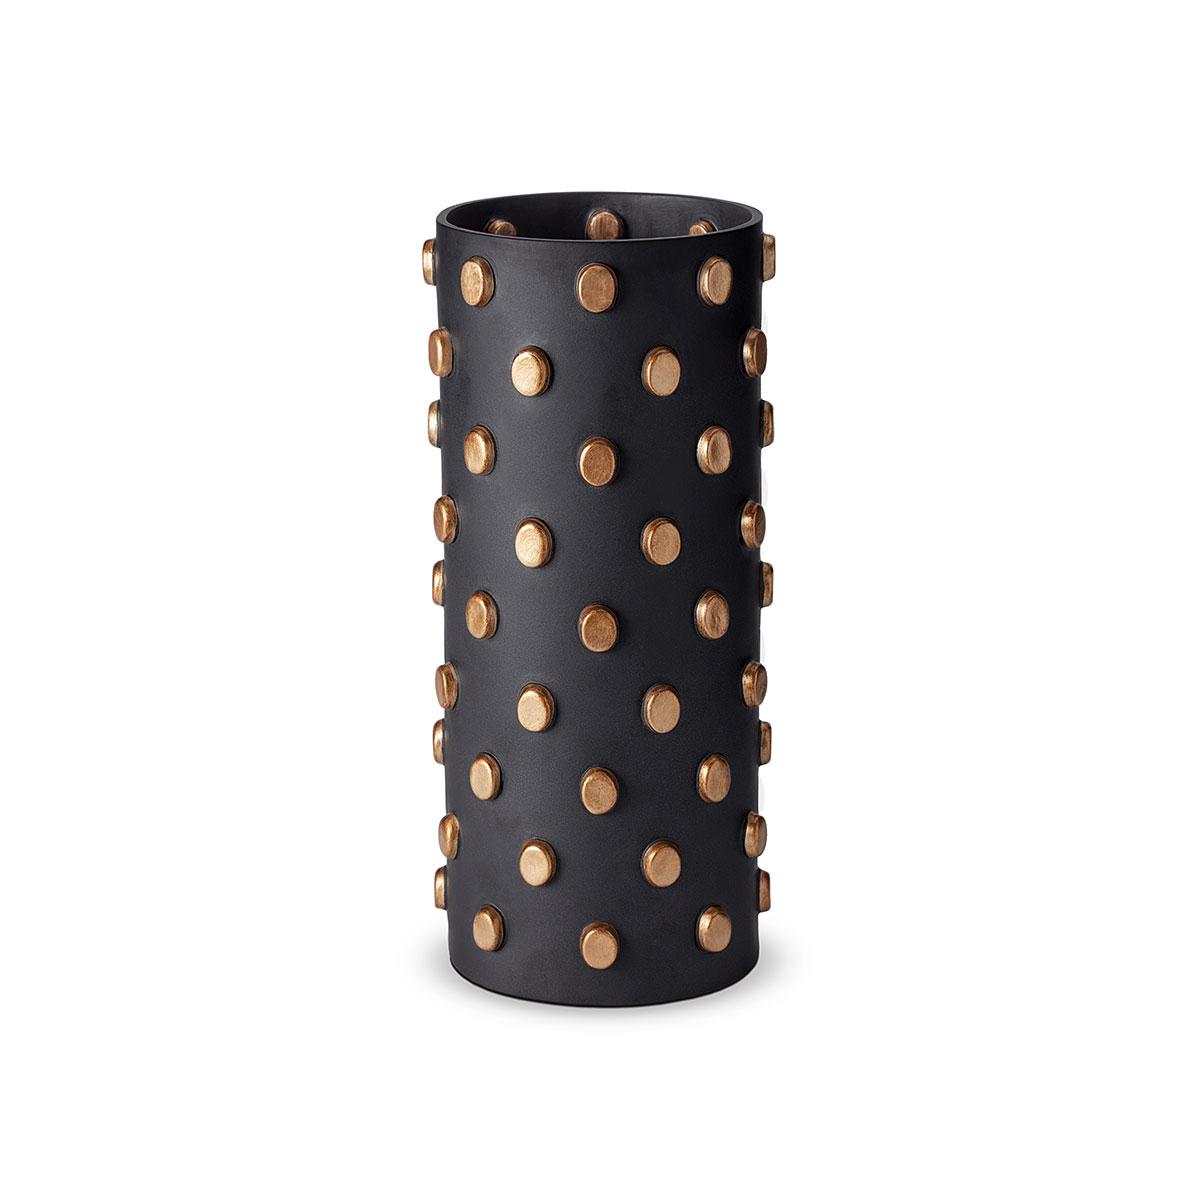 L'Objet I Teo Black Vase Large Black